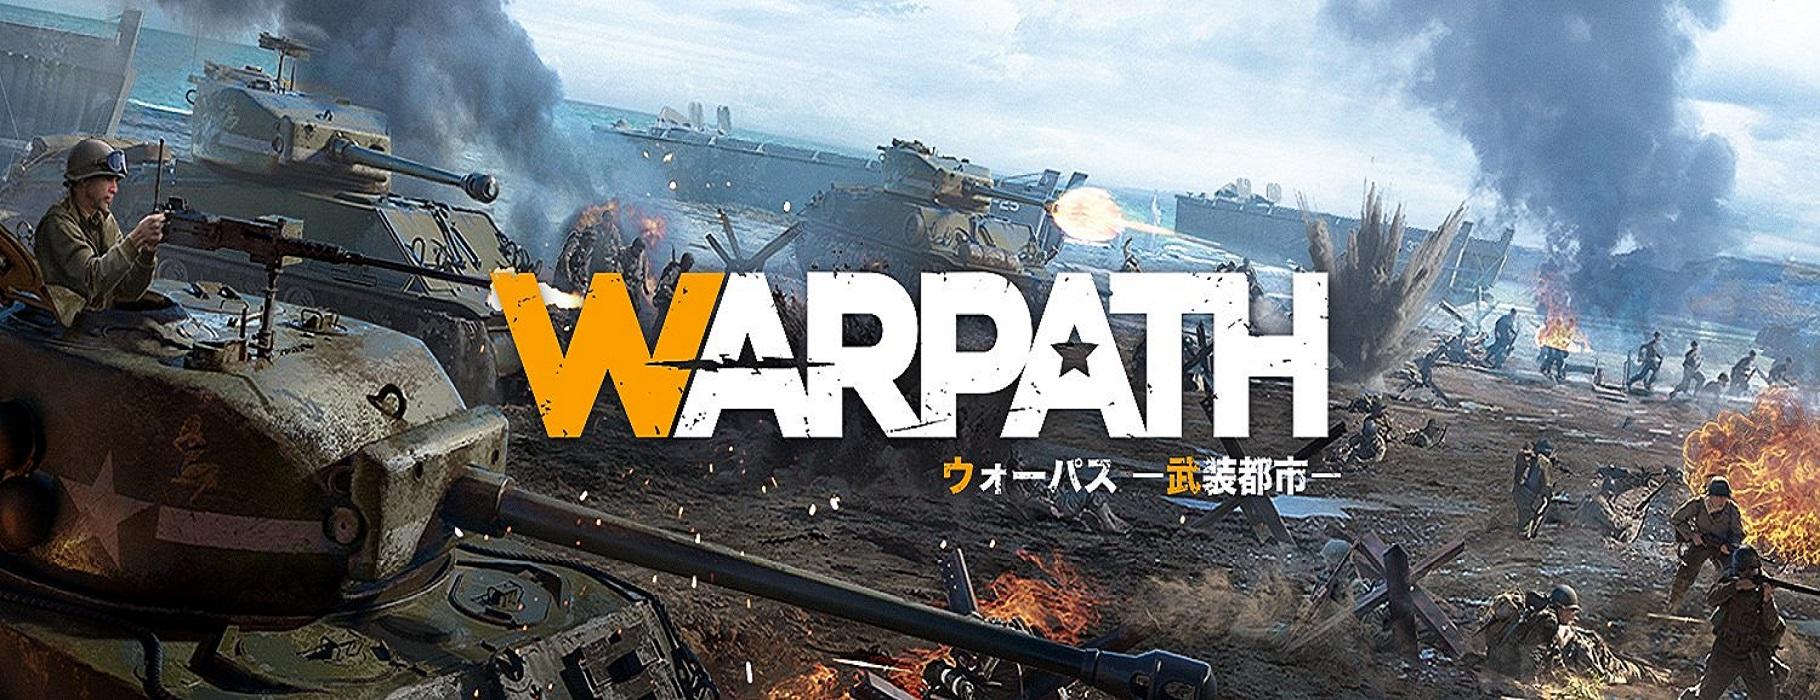 「WARPATH-武装都市-」